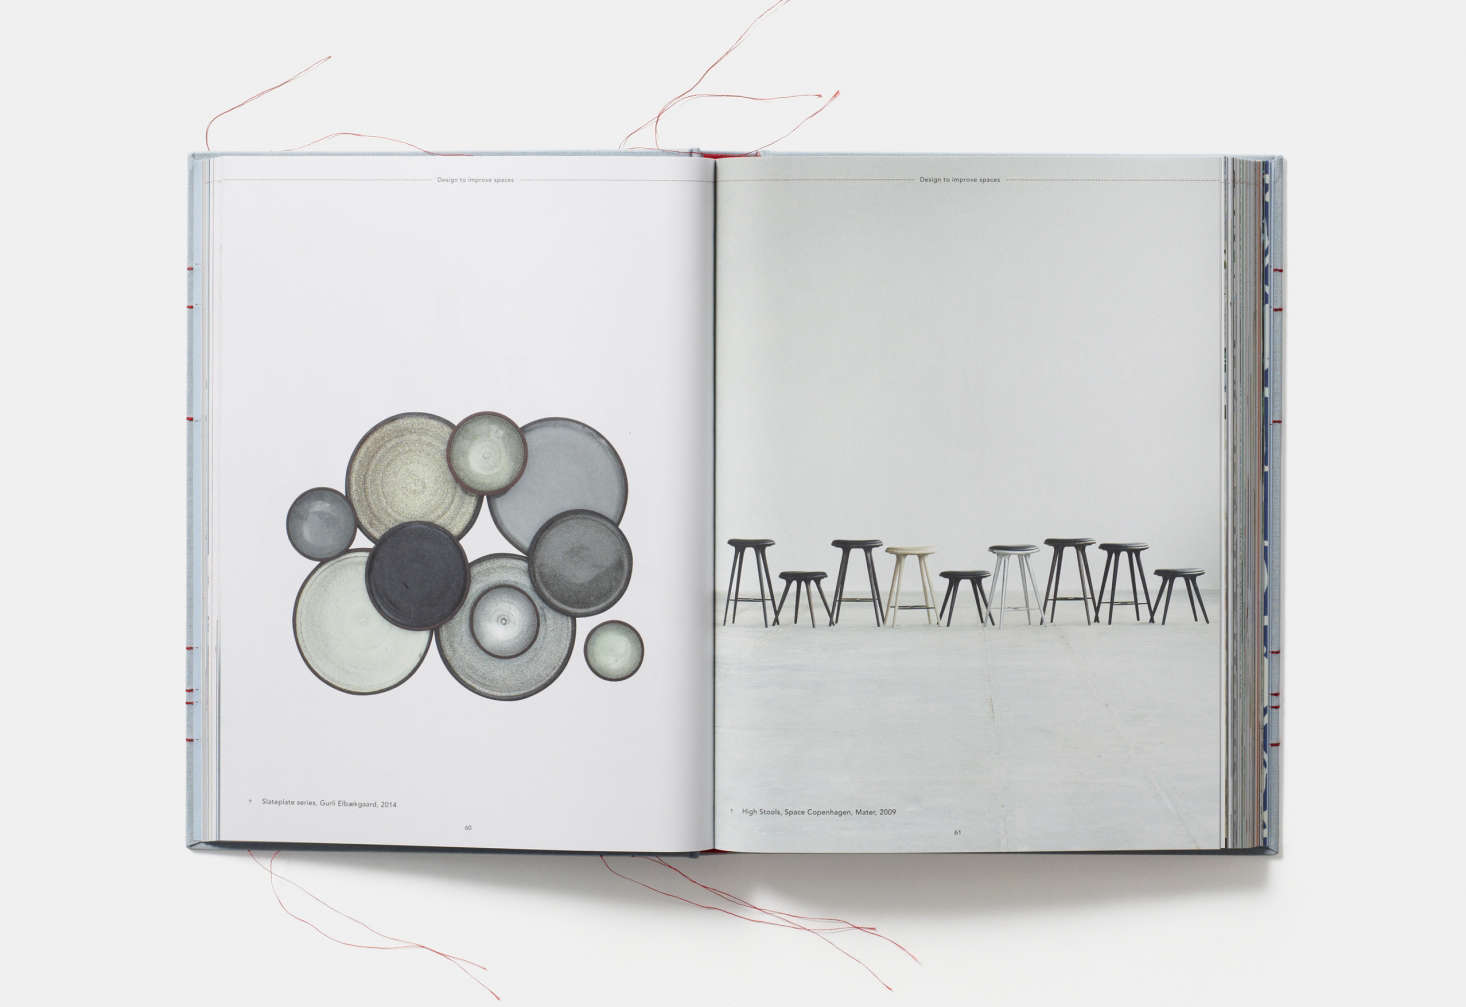 Slateplate pottery byGurli Elbaekgaard andHigh stools designed by Space Copenhagen.